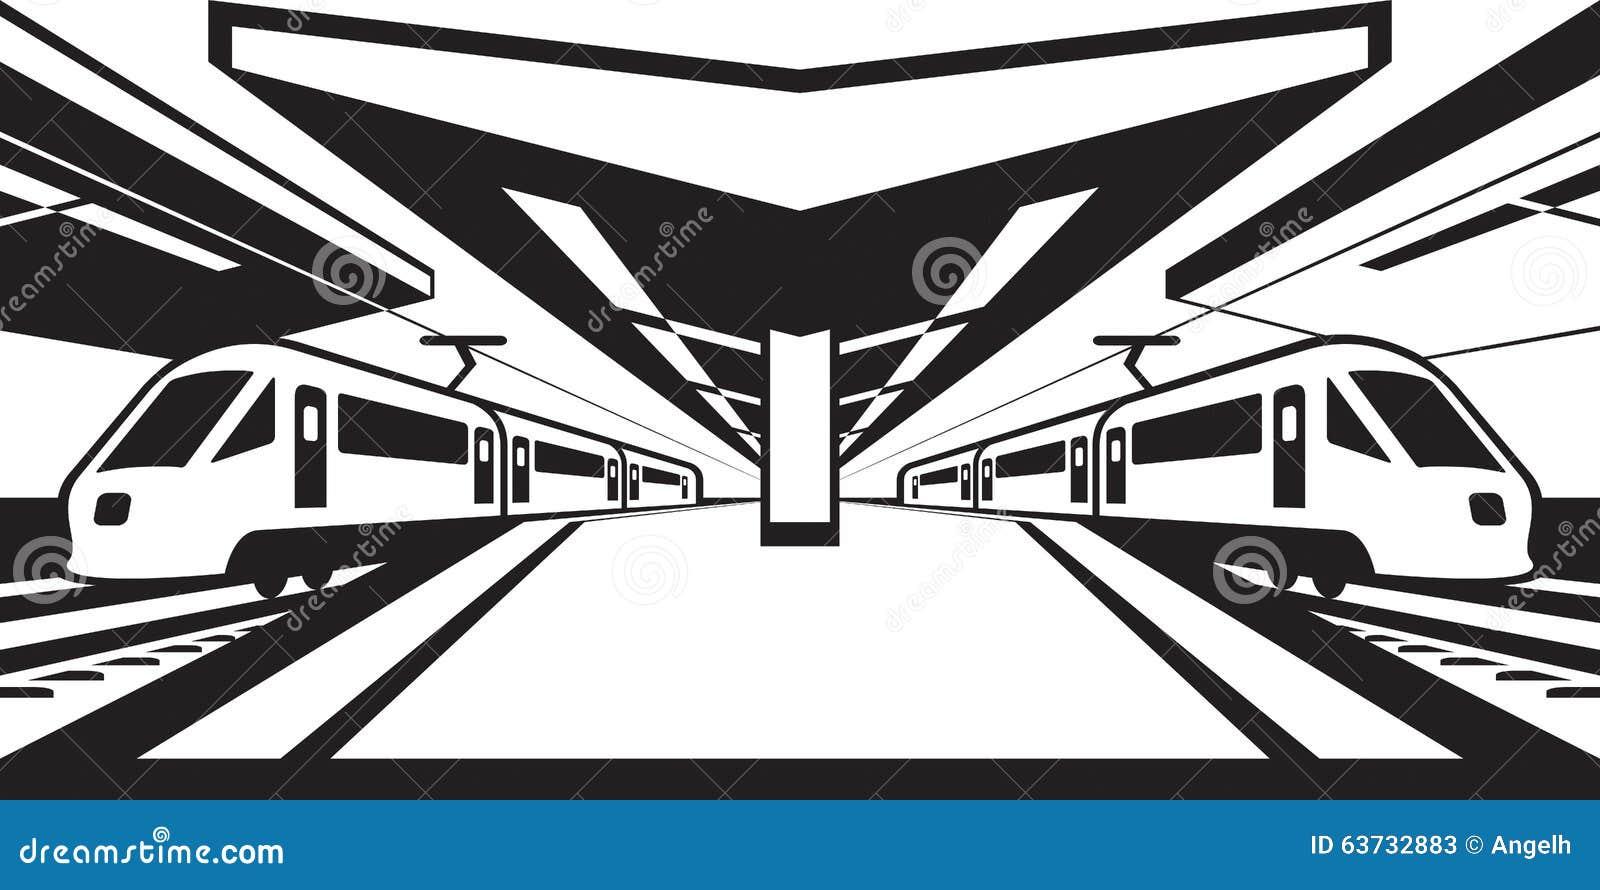 train platform clipart - photo #32